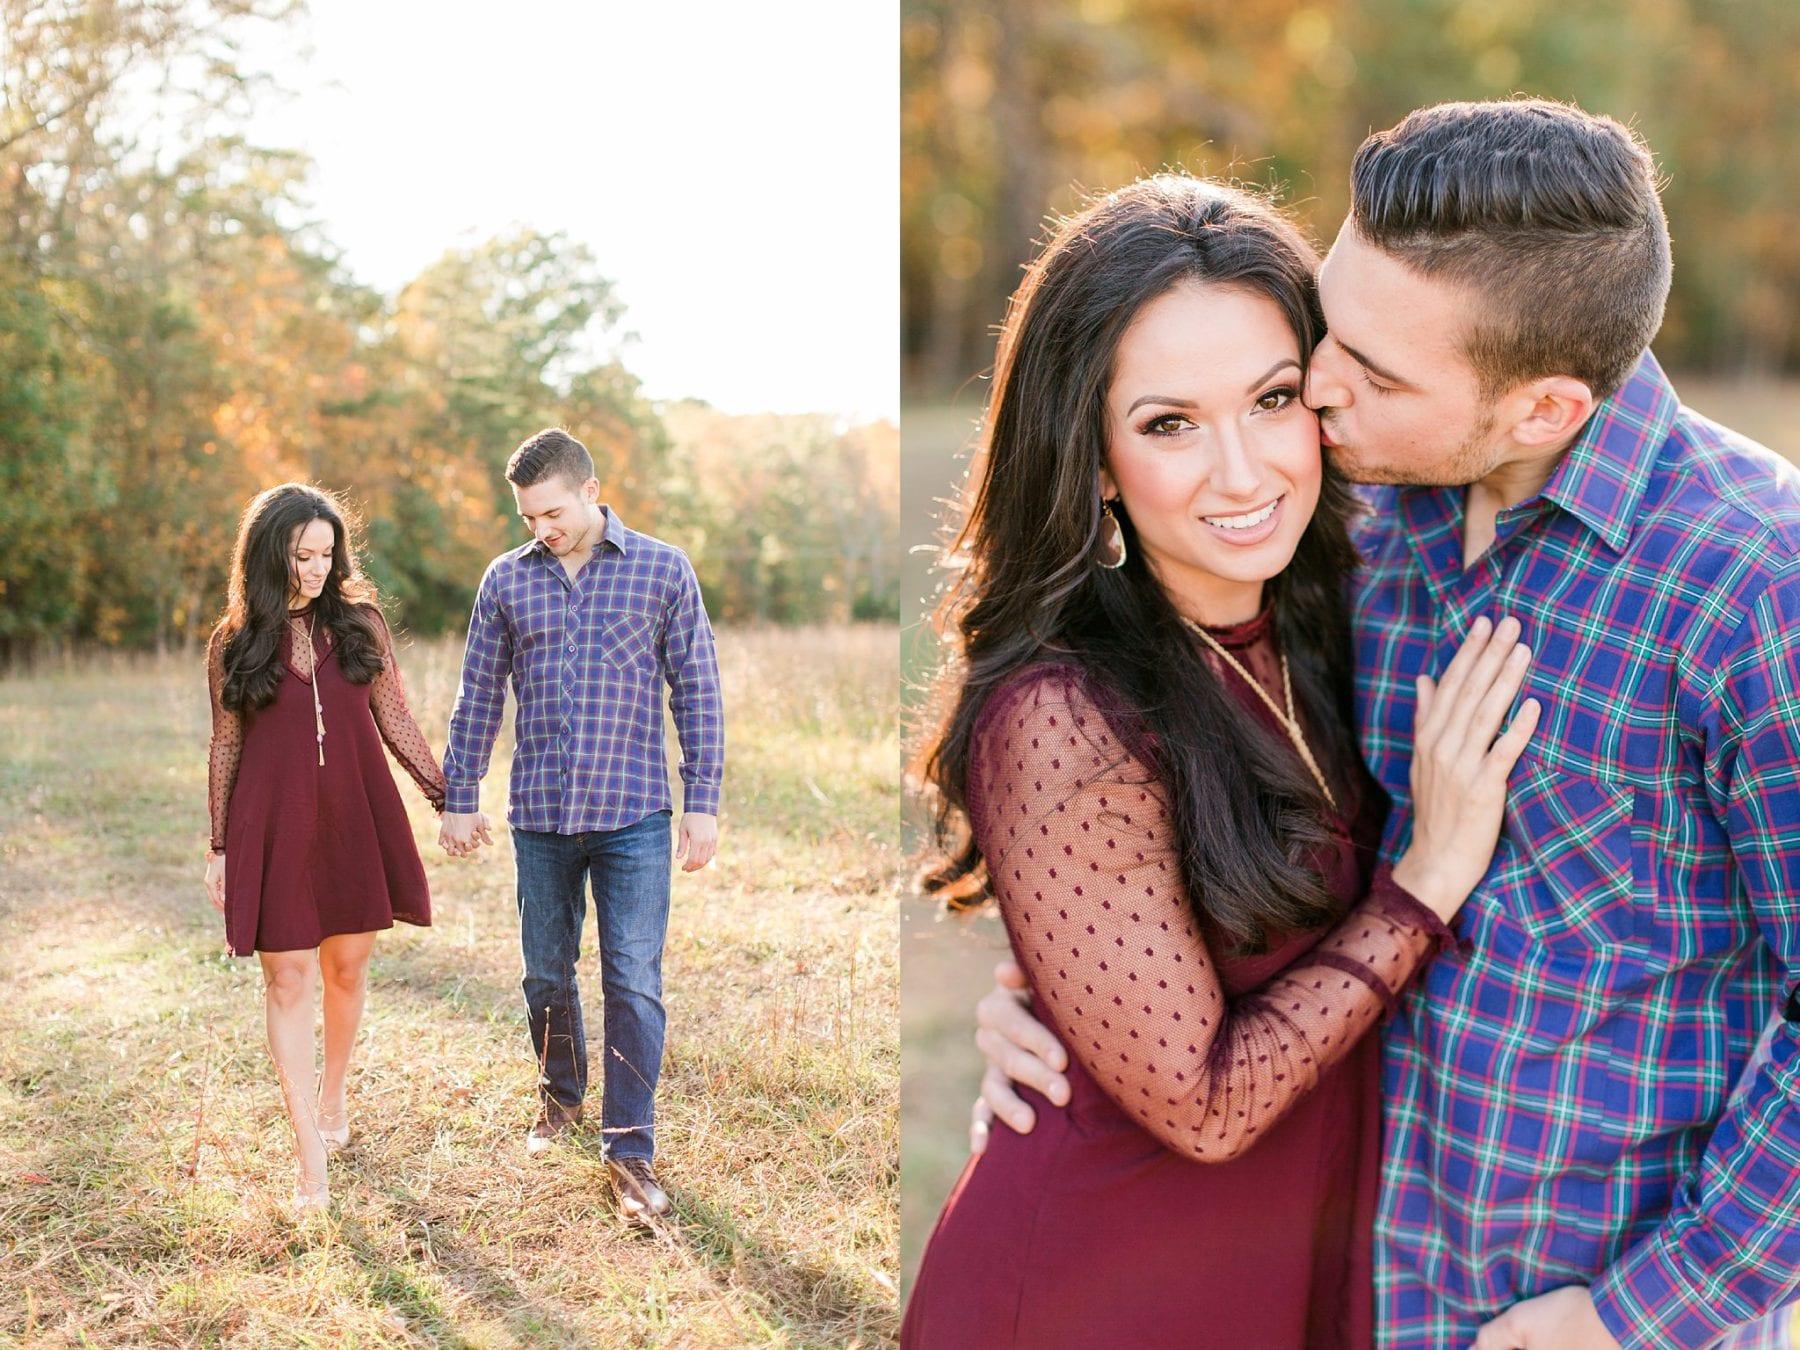 Manassas Battlefield Portraits Virginia Wedding Photographer Megan Kelsey Photography Lianne & Chris-15.jpg